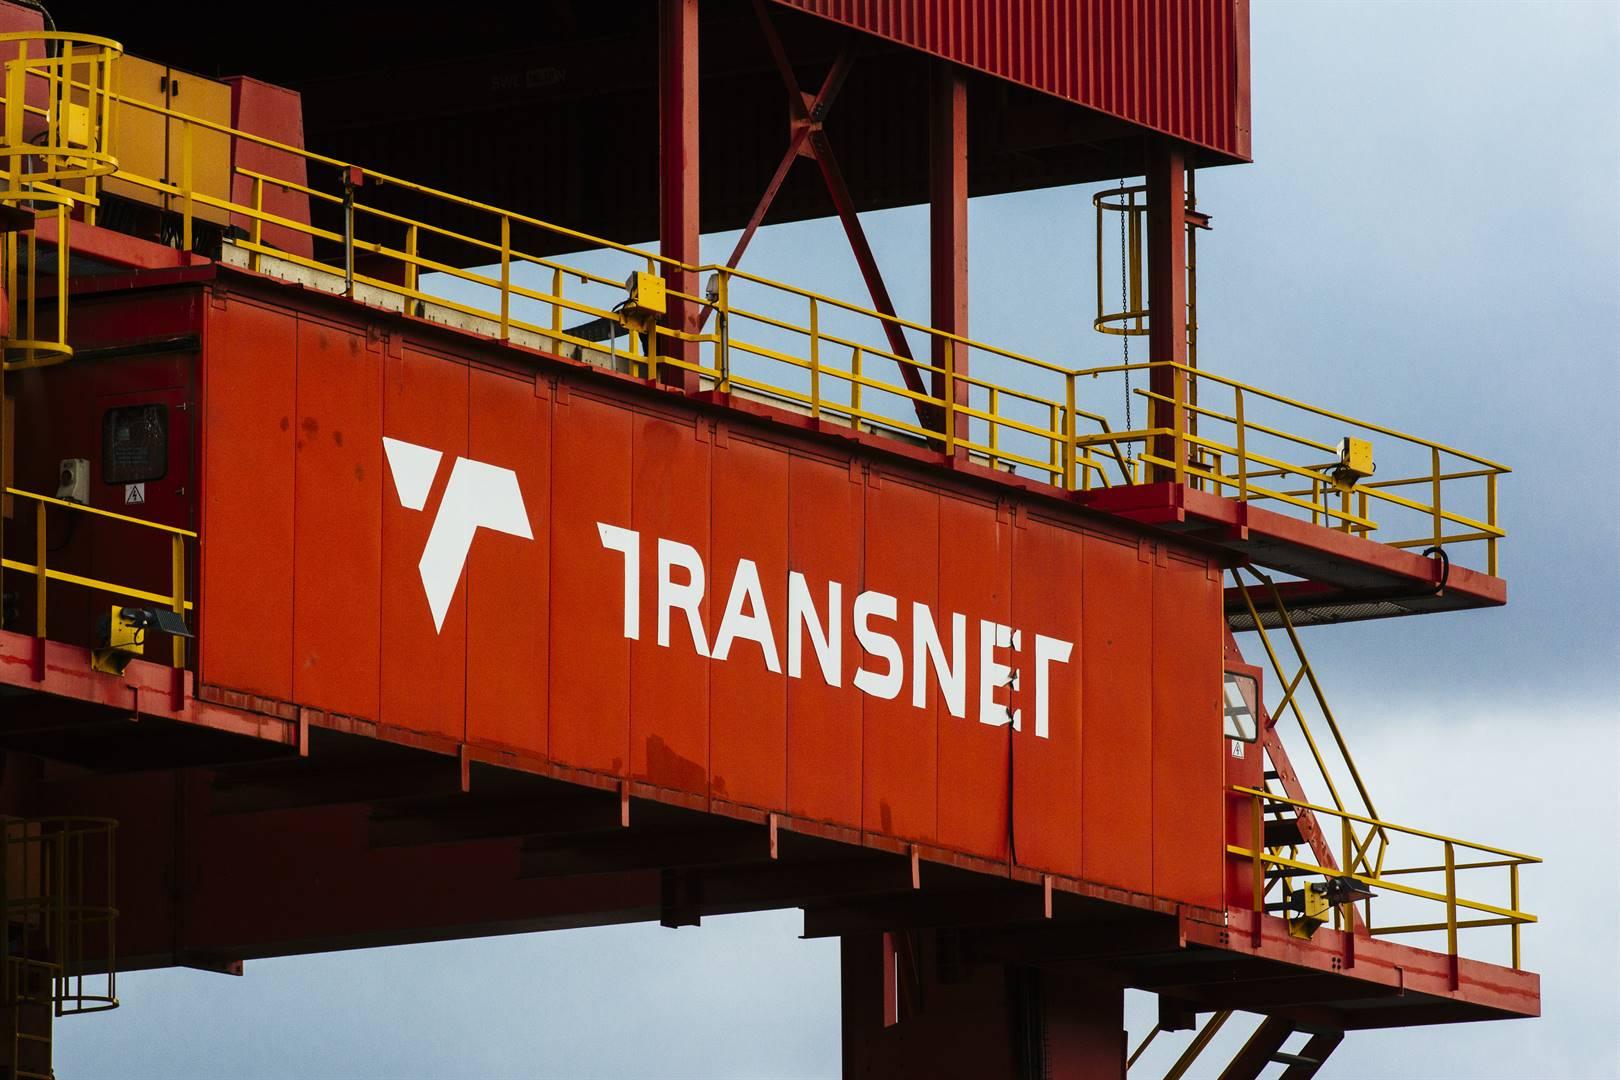 Transnet cyberattack consistent with insurrection modus operandi